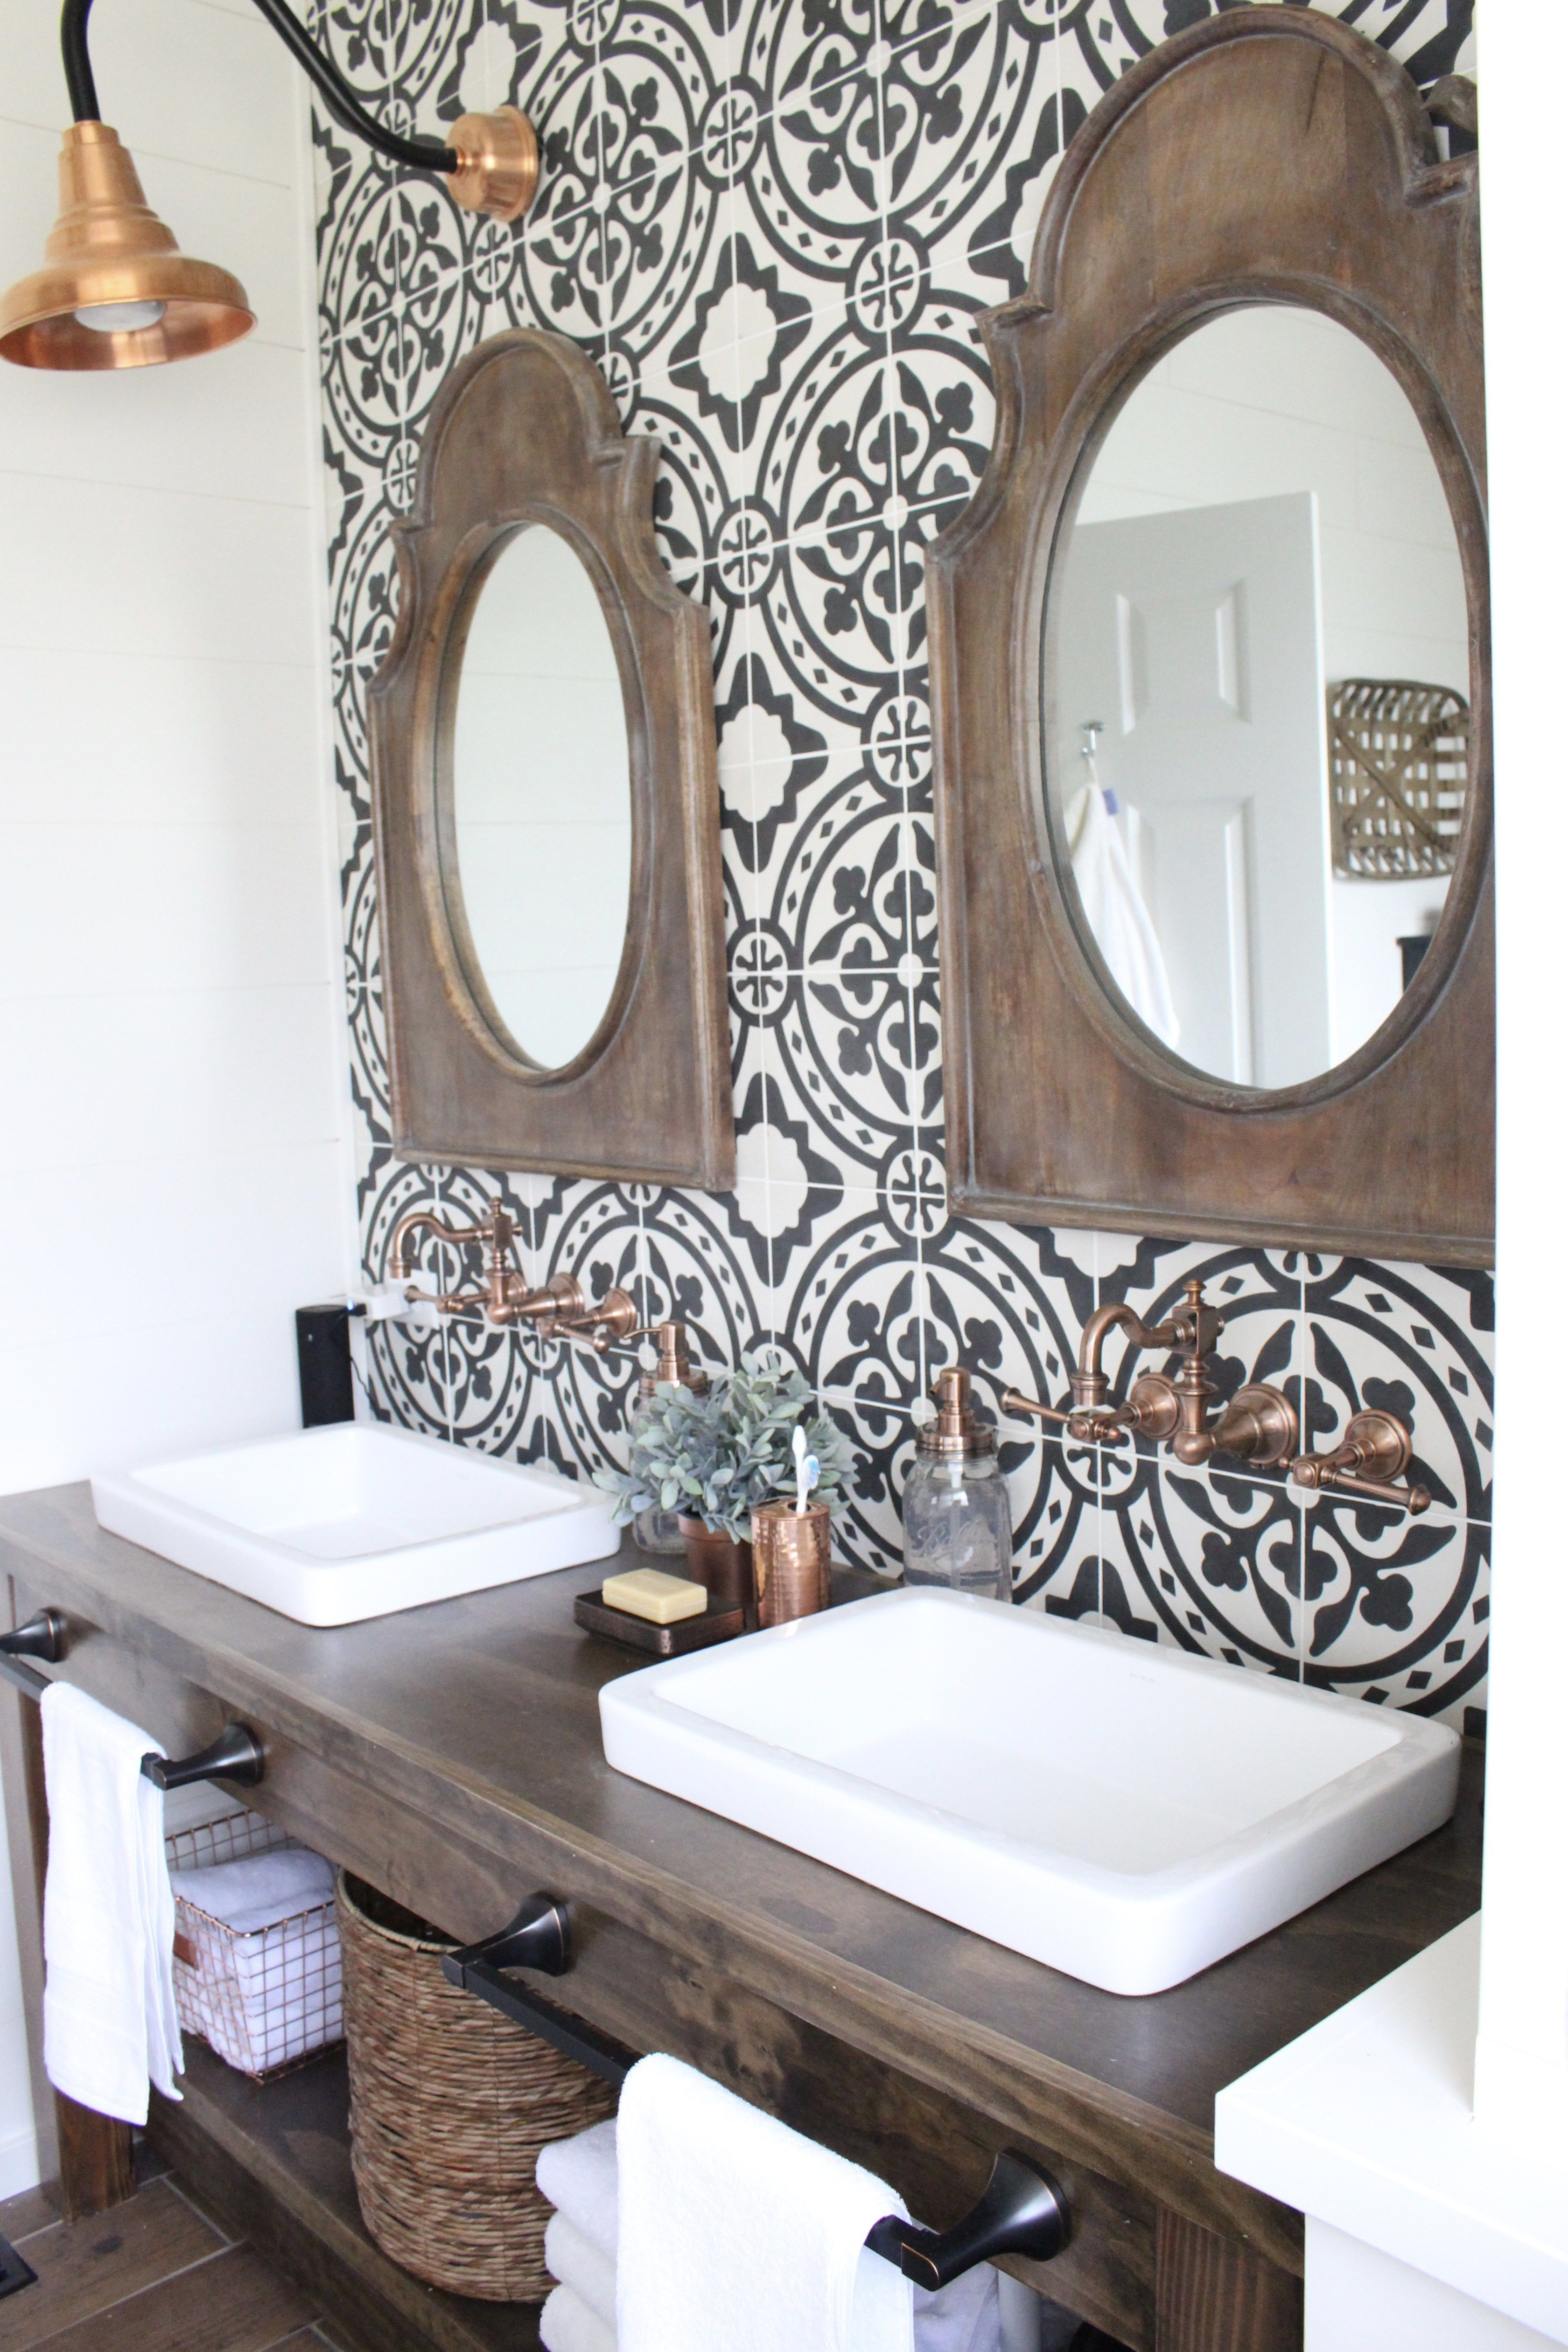 Modern farmhouse bathroom remodel reveal farmhouse style bathrooms